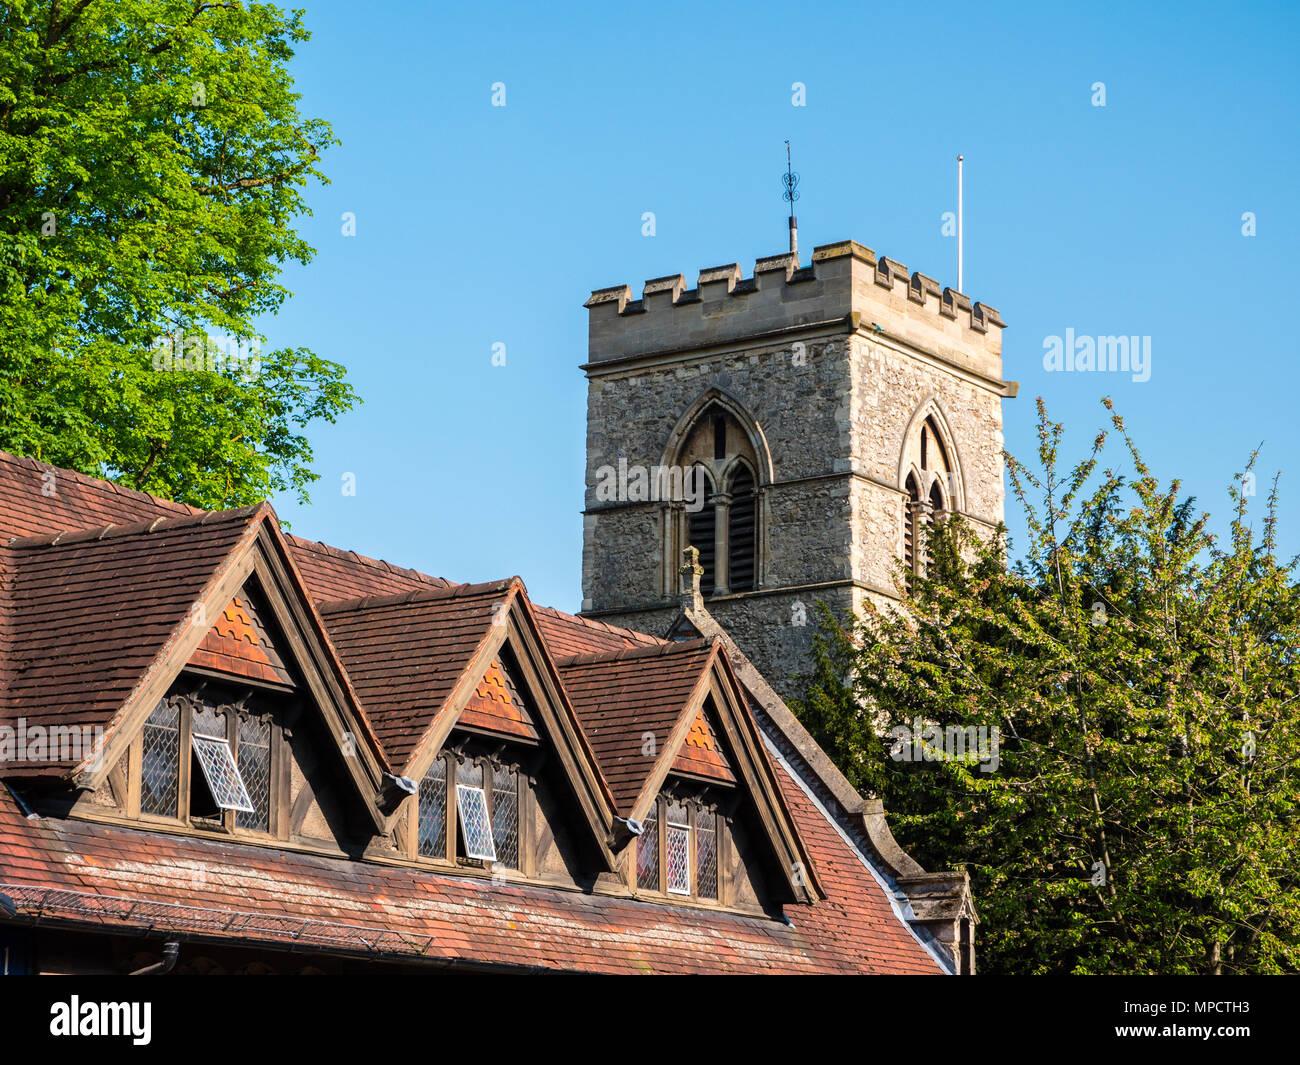 St Giles Church, Oxford, Oxfordshire, England, UK, GB. Stock Photo